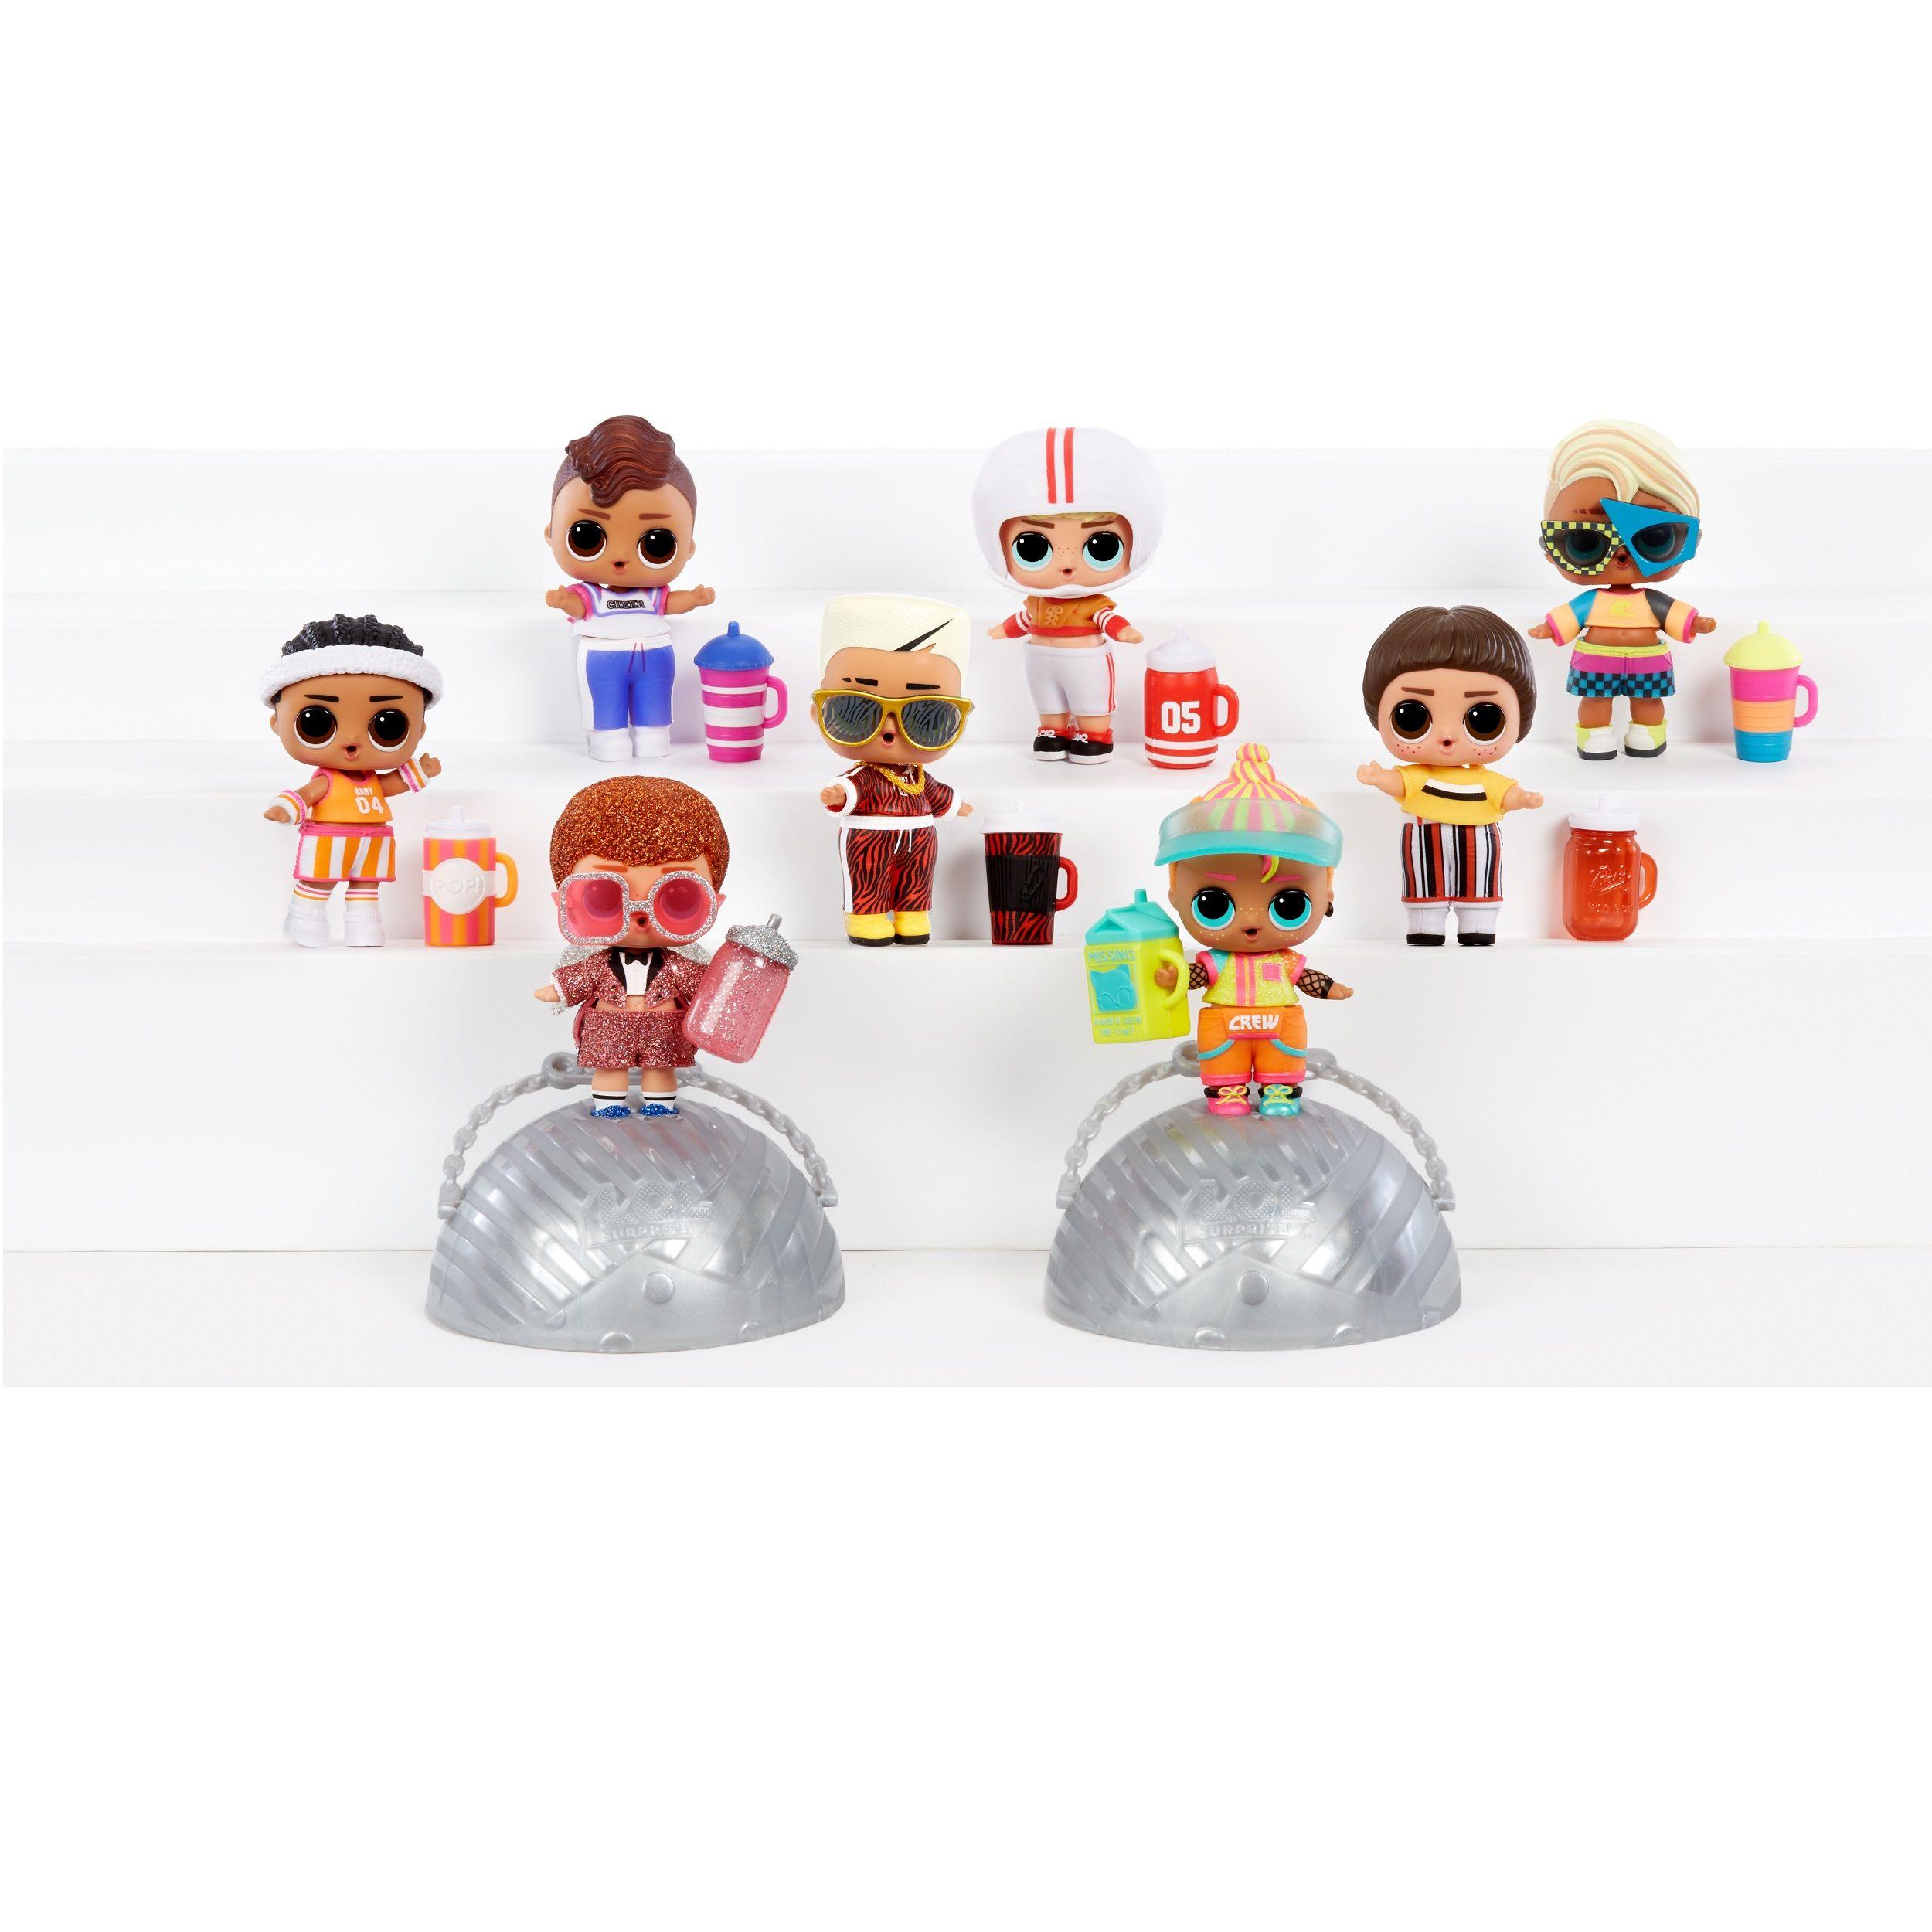 Toys Lol dolls, Dolls, Doll stands